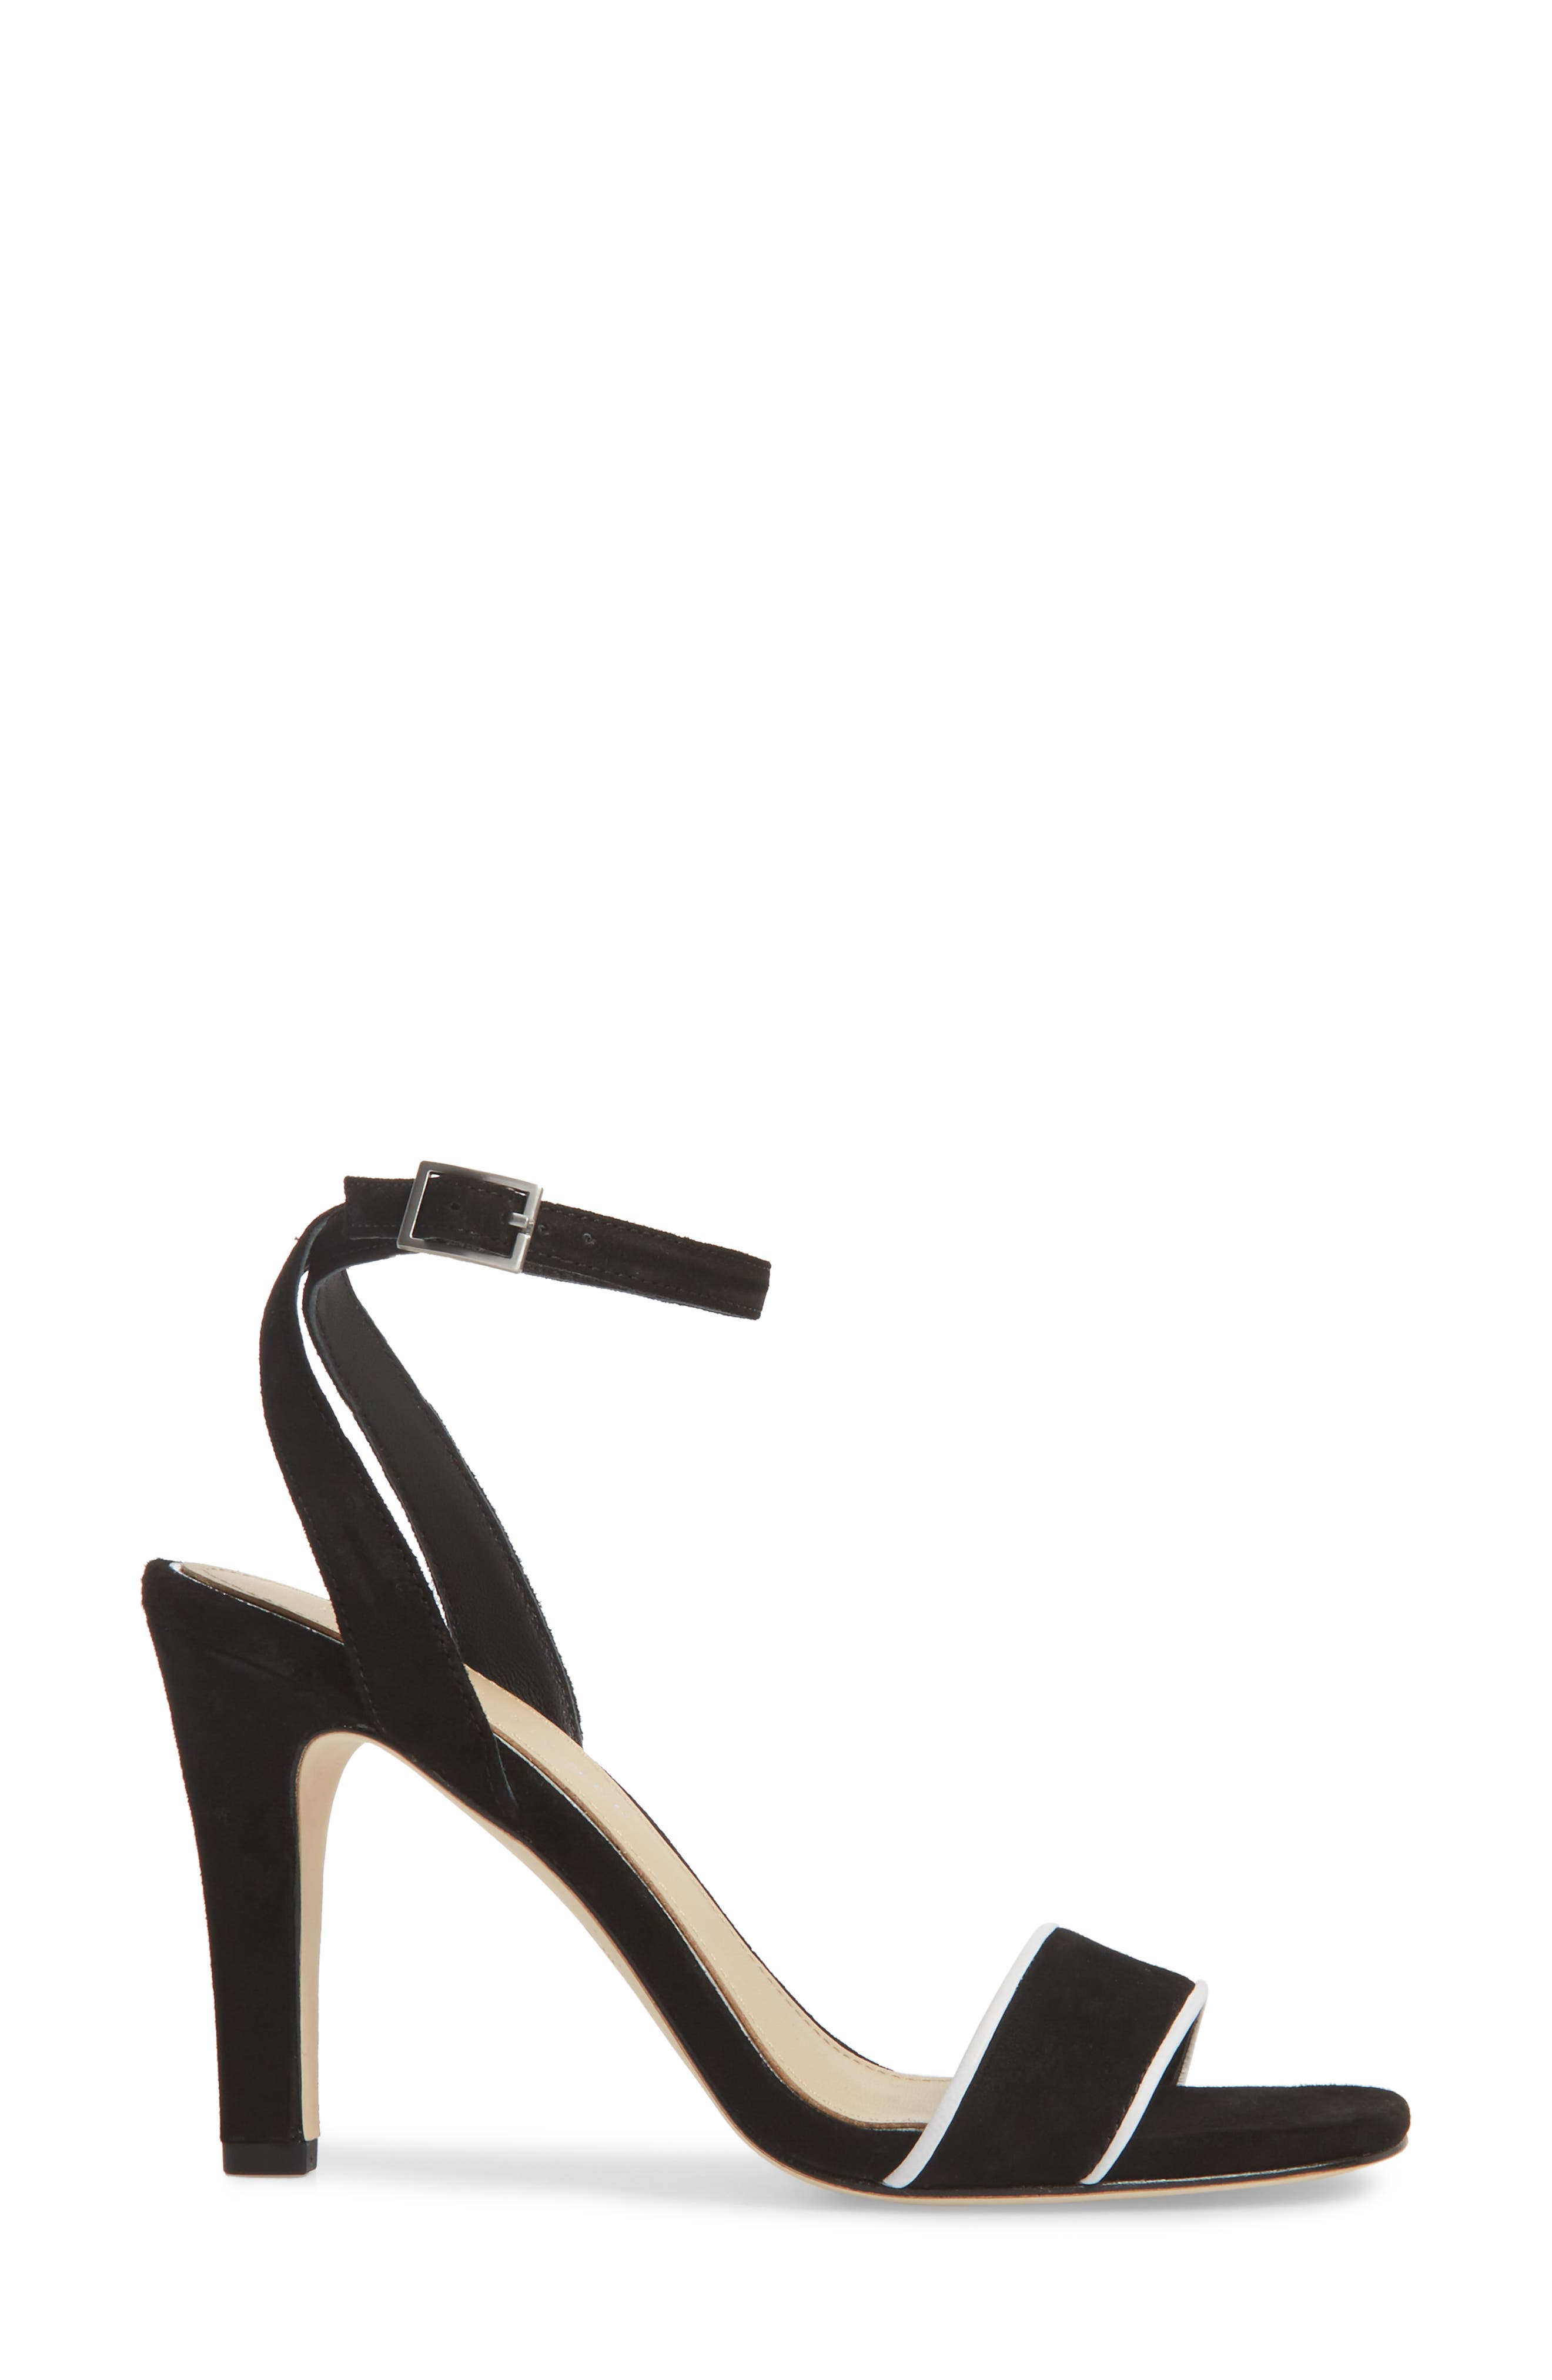 Martini Sandal,                             Alternate thumbnail 3, color,                             BLACK/ WHITE SUEDE